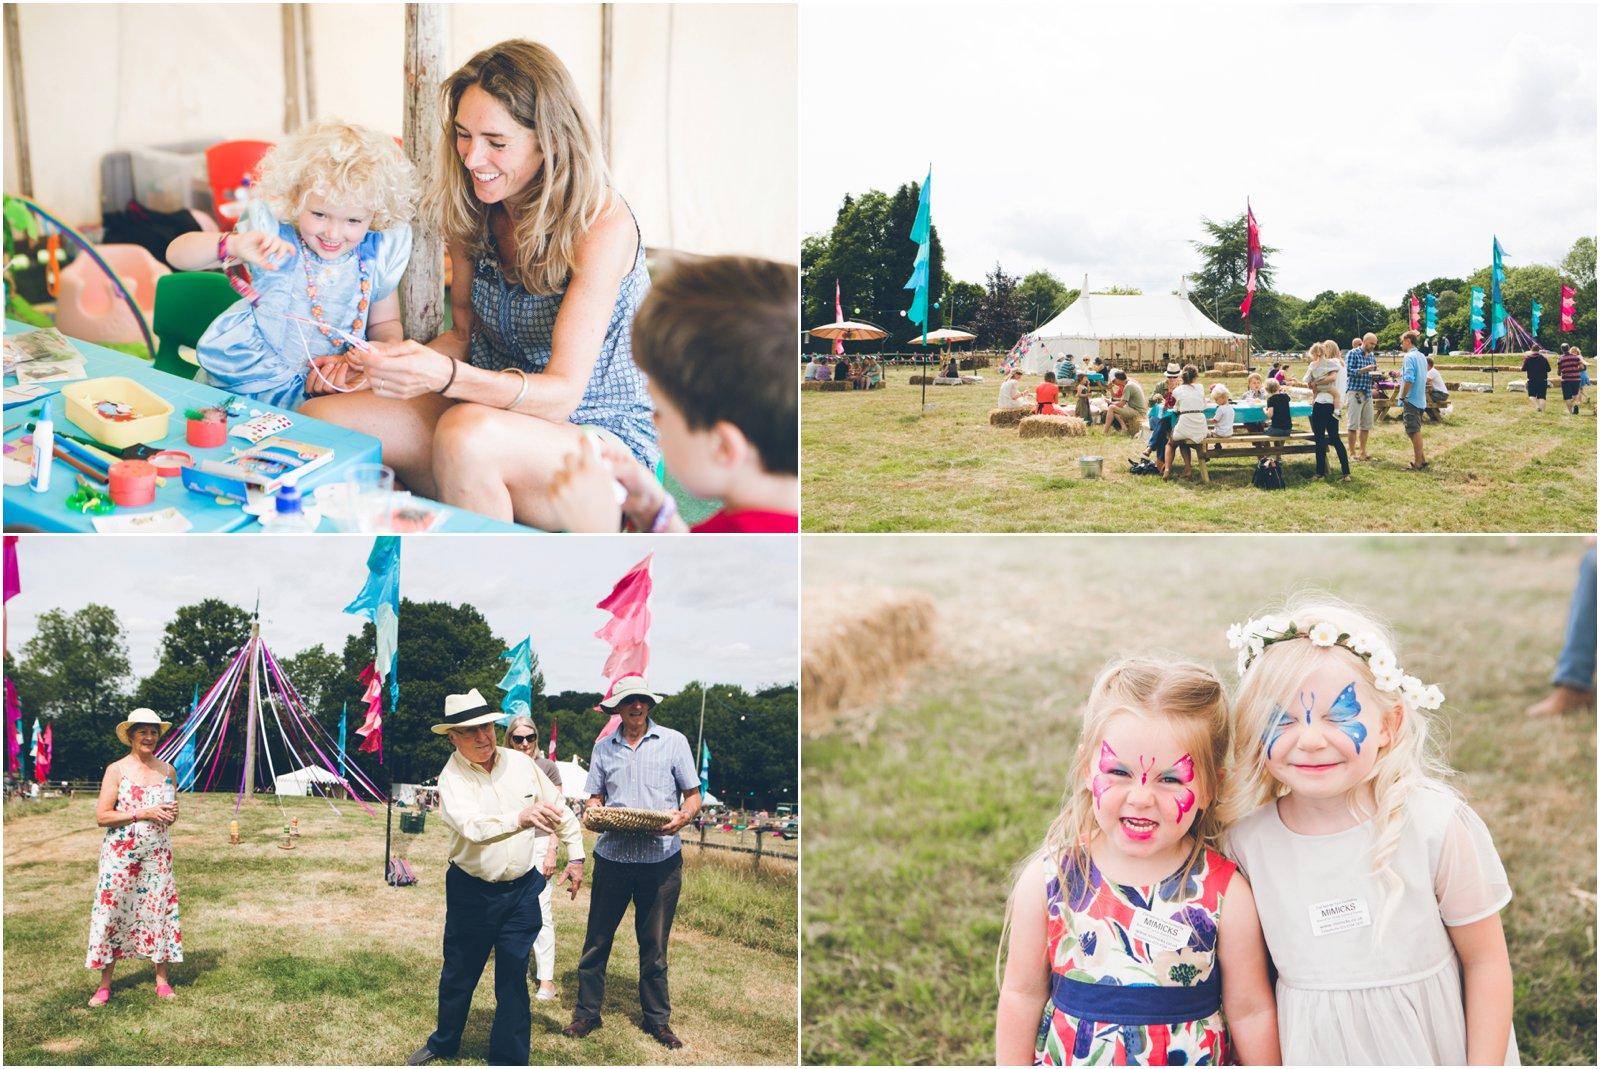 Sally and Damien's wedding festival by Summertown Pictures-39_DerrynSchmidt